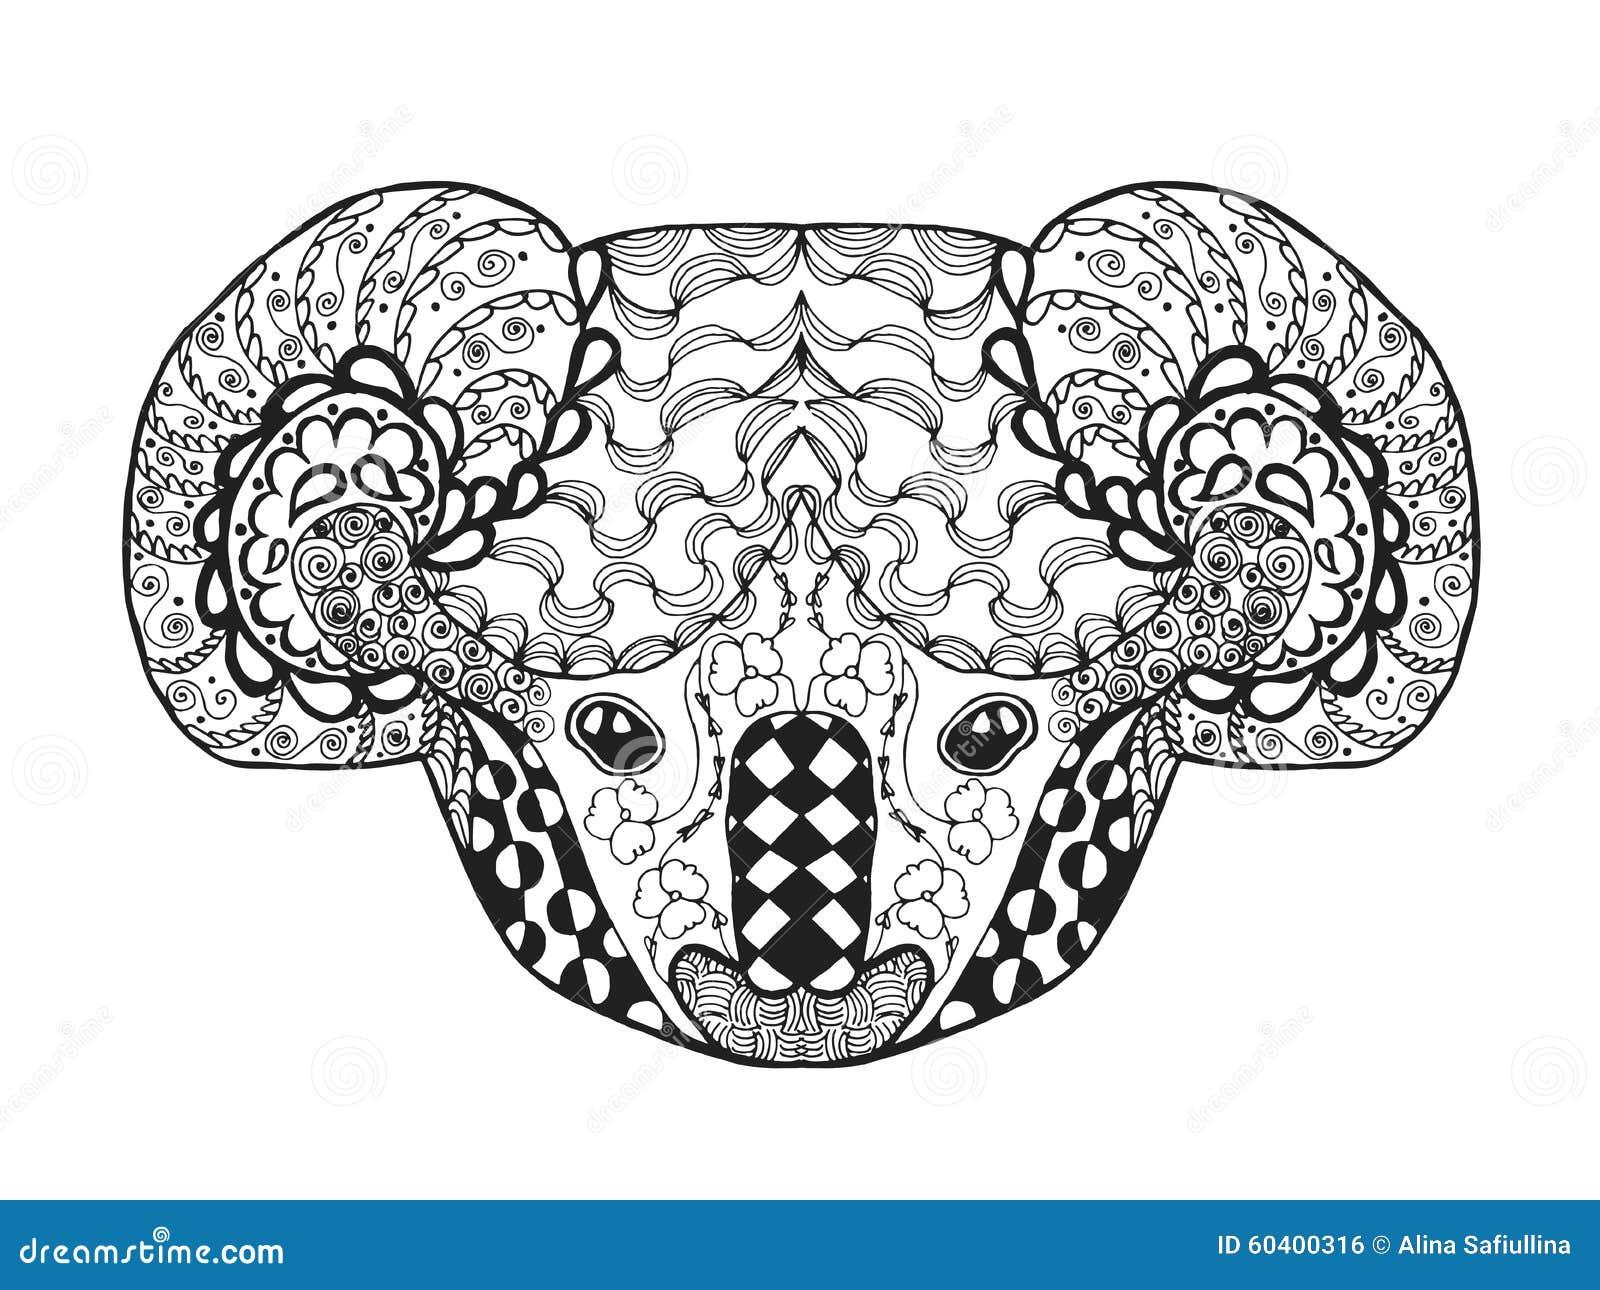 zentangle stylized koala head sketch tattoo t shirt adult antistress coloring page black white hand drawn doodle animal